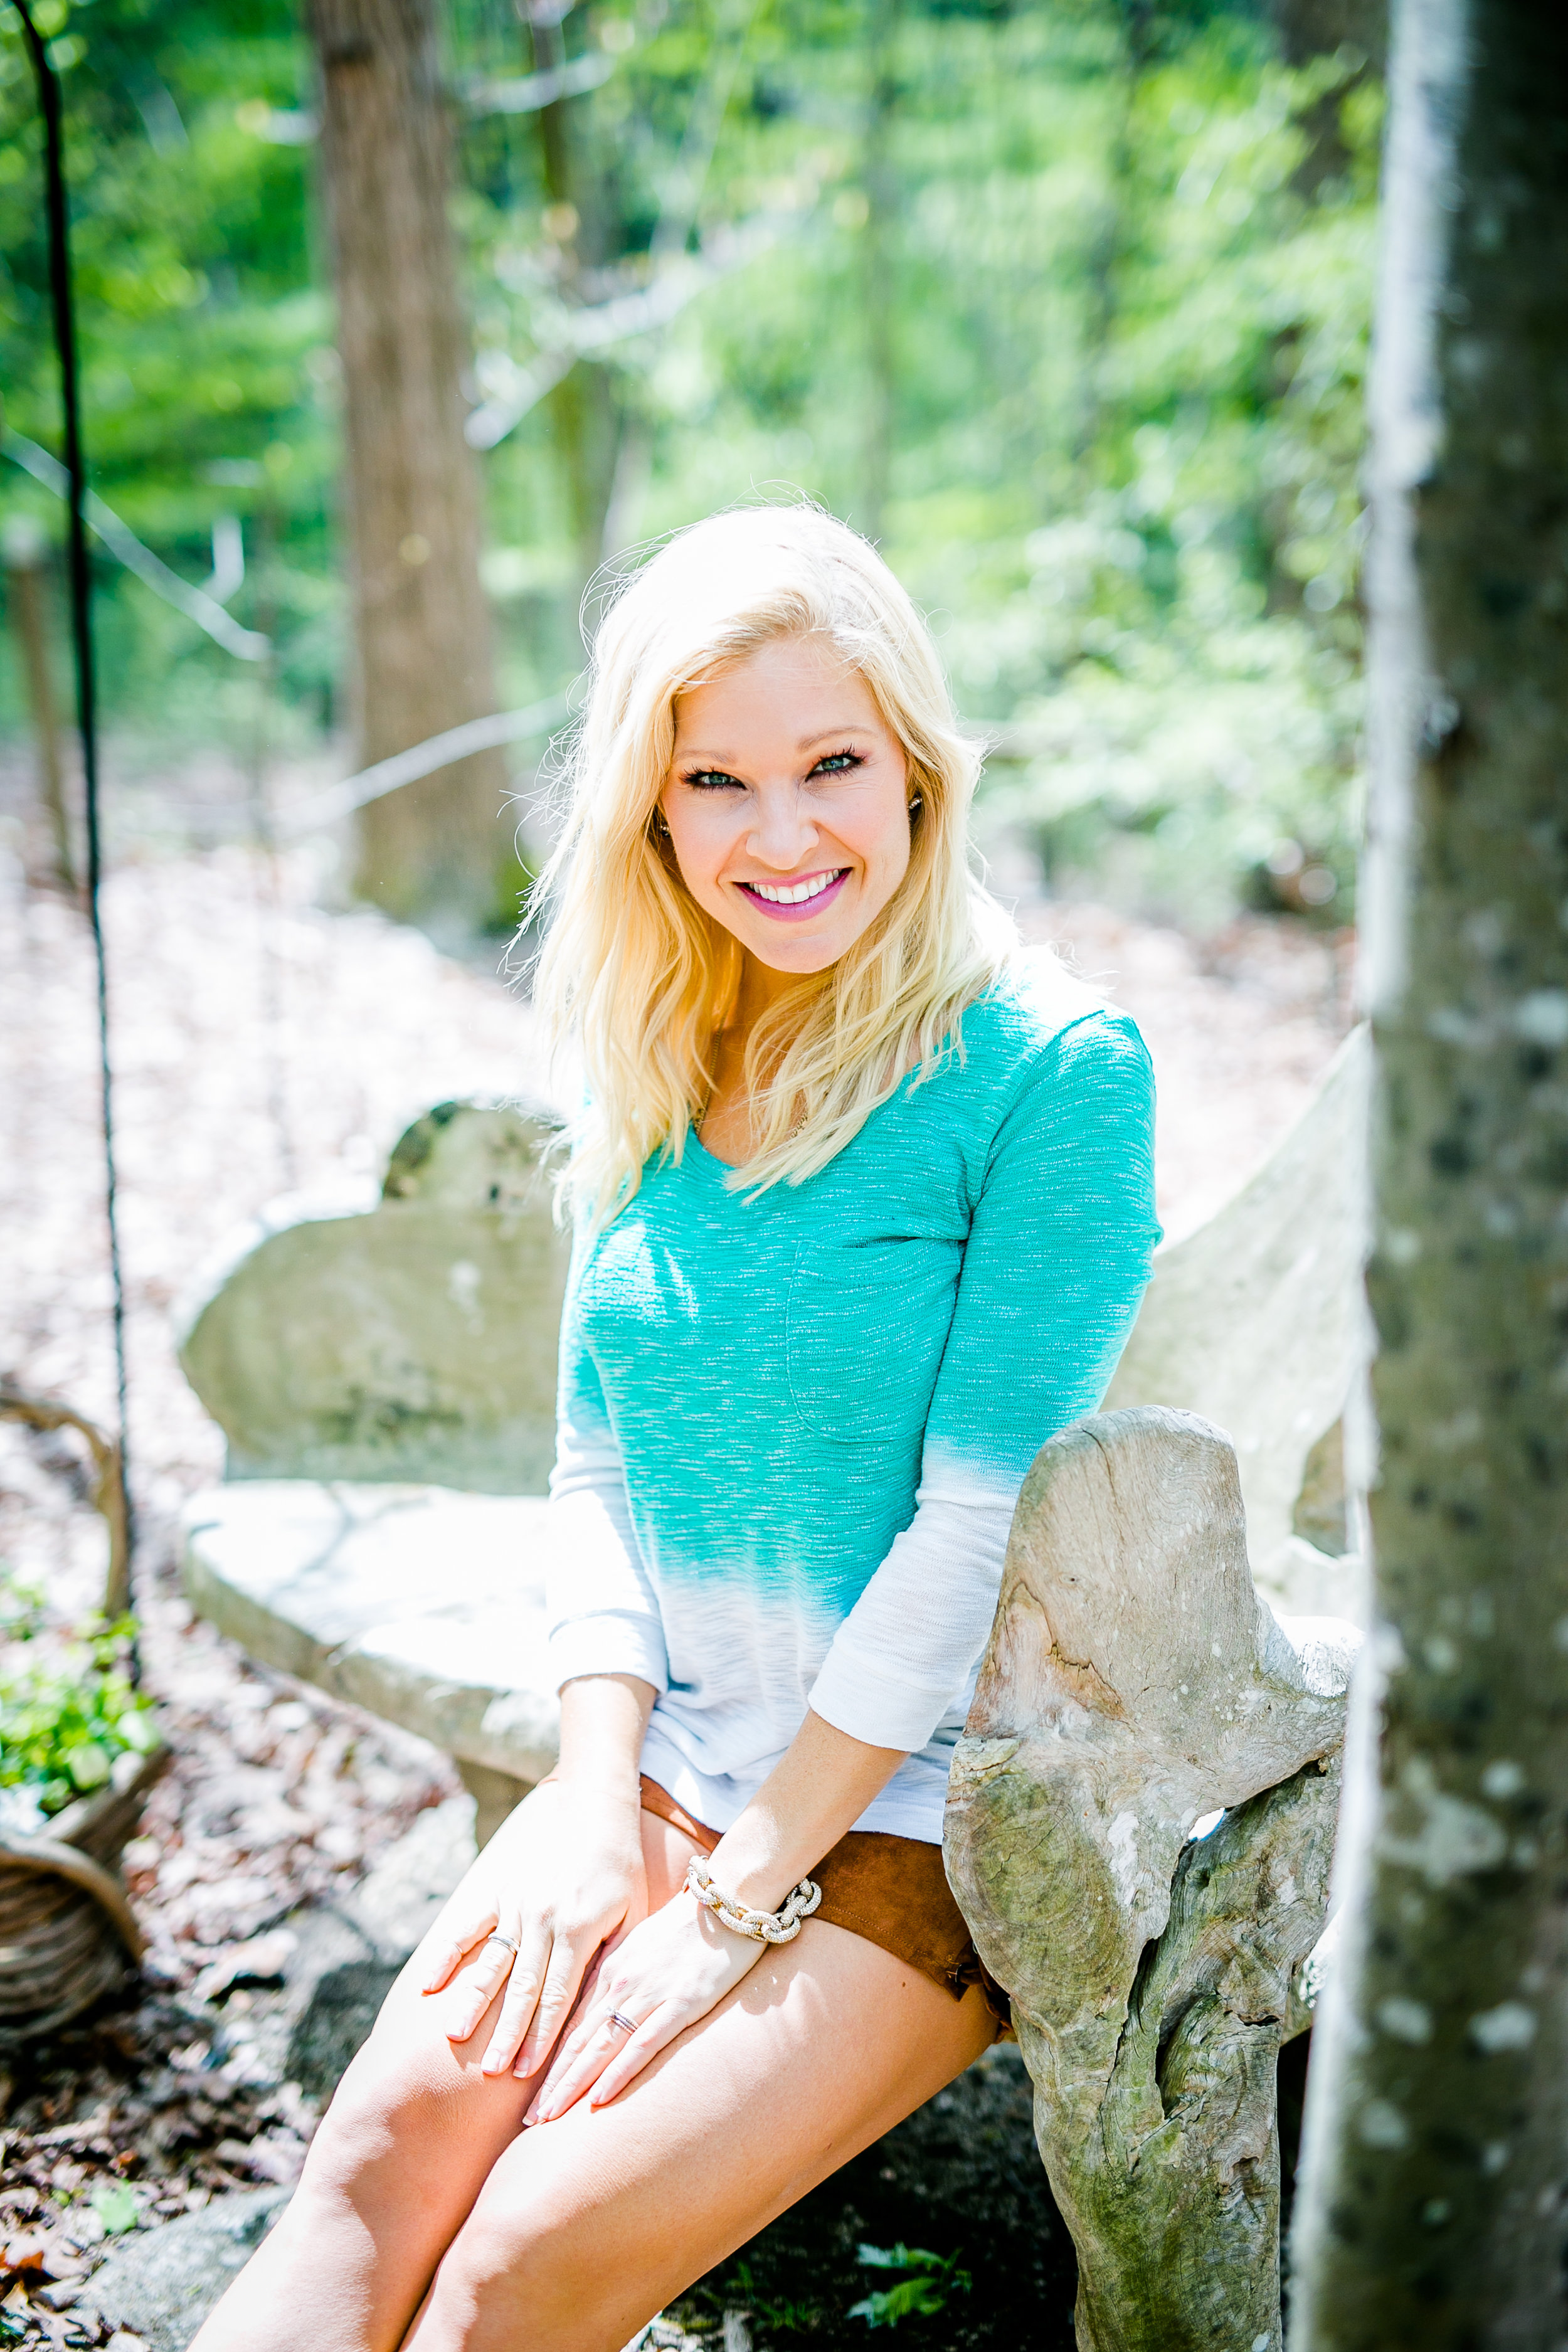 Anna Kooiman seated wooden bench in north carolina woods teal top brown shorts eben adrian patten